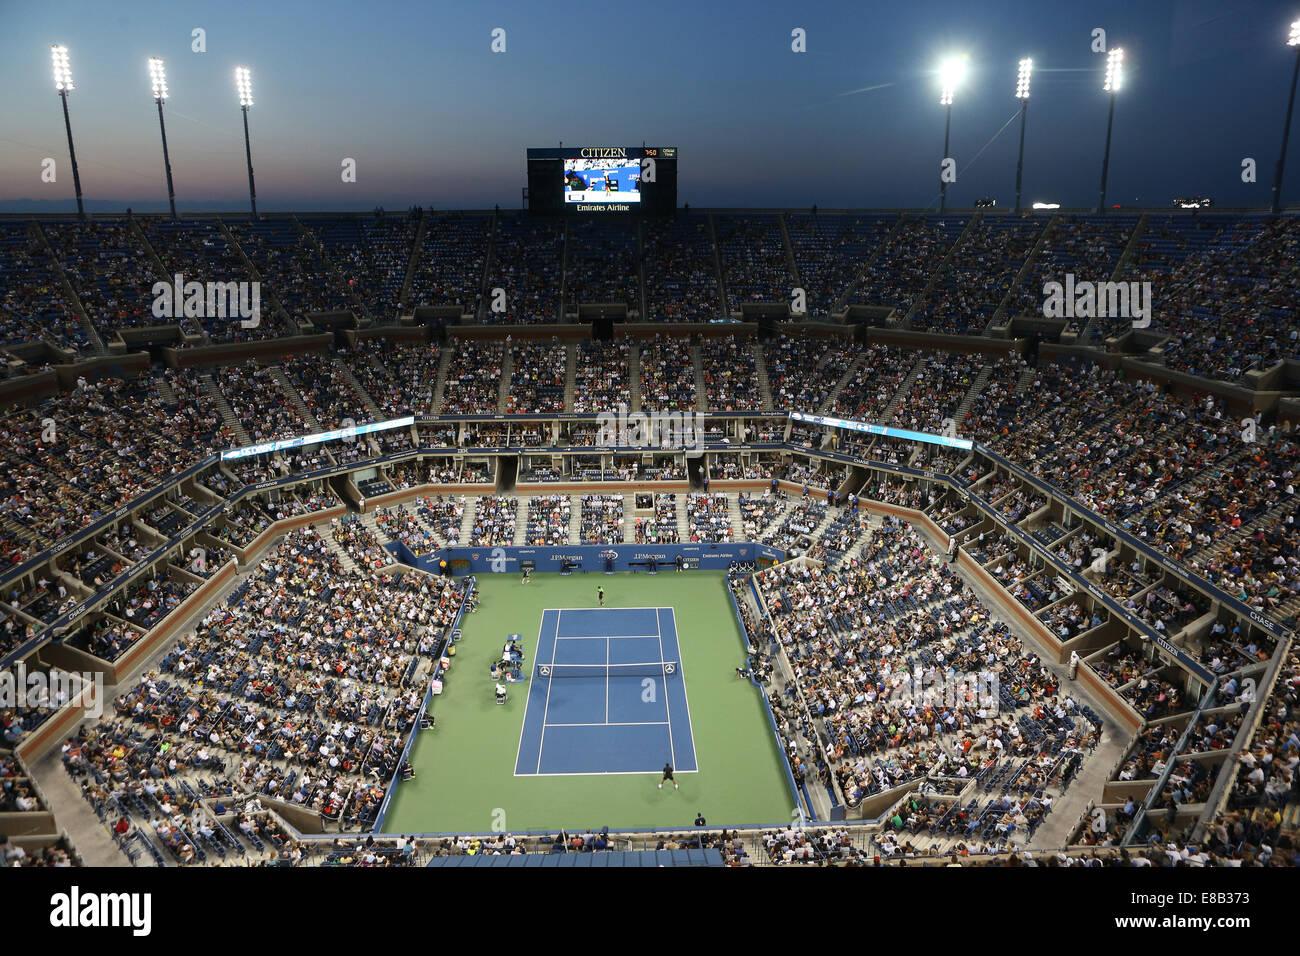 Arthur Ashe Stadium, Centre Court at night, US Open 2014, New York,USA - Stock Image